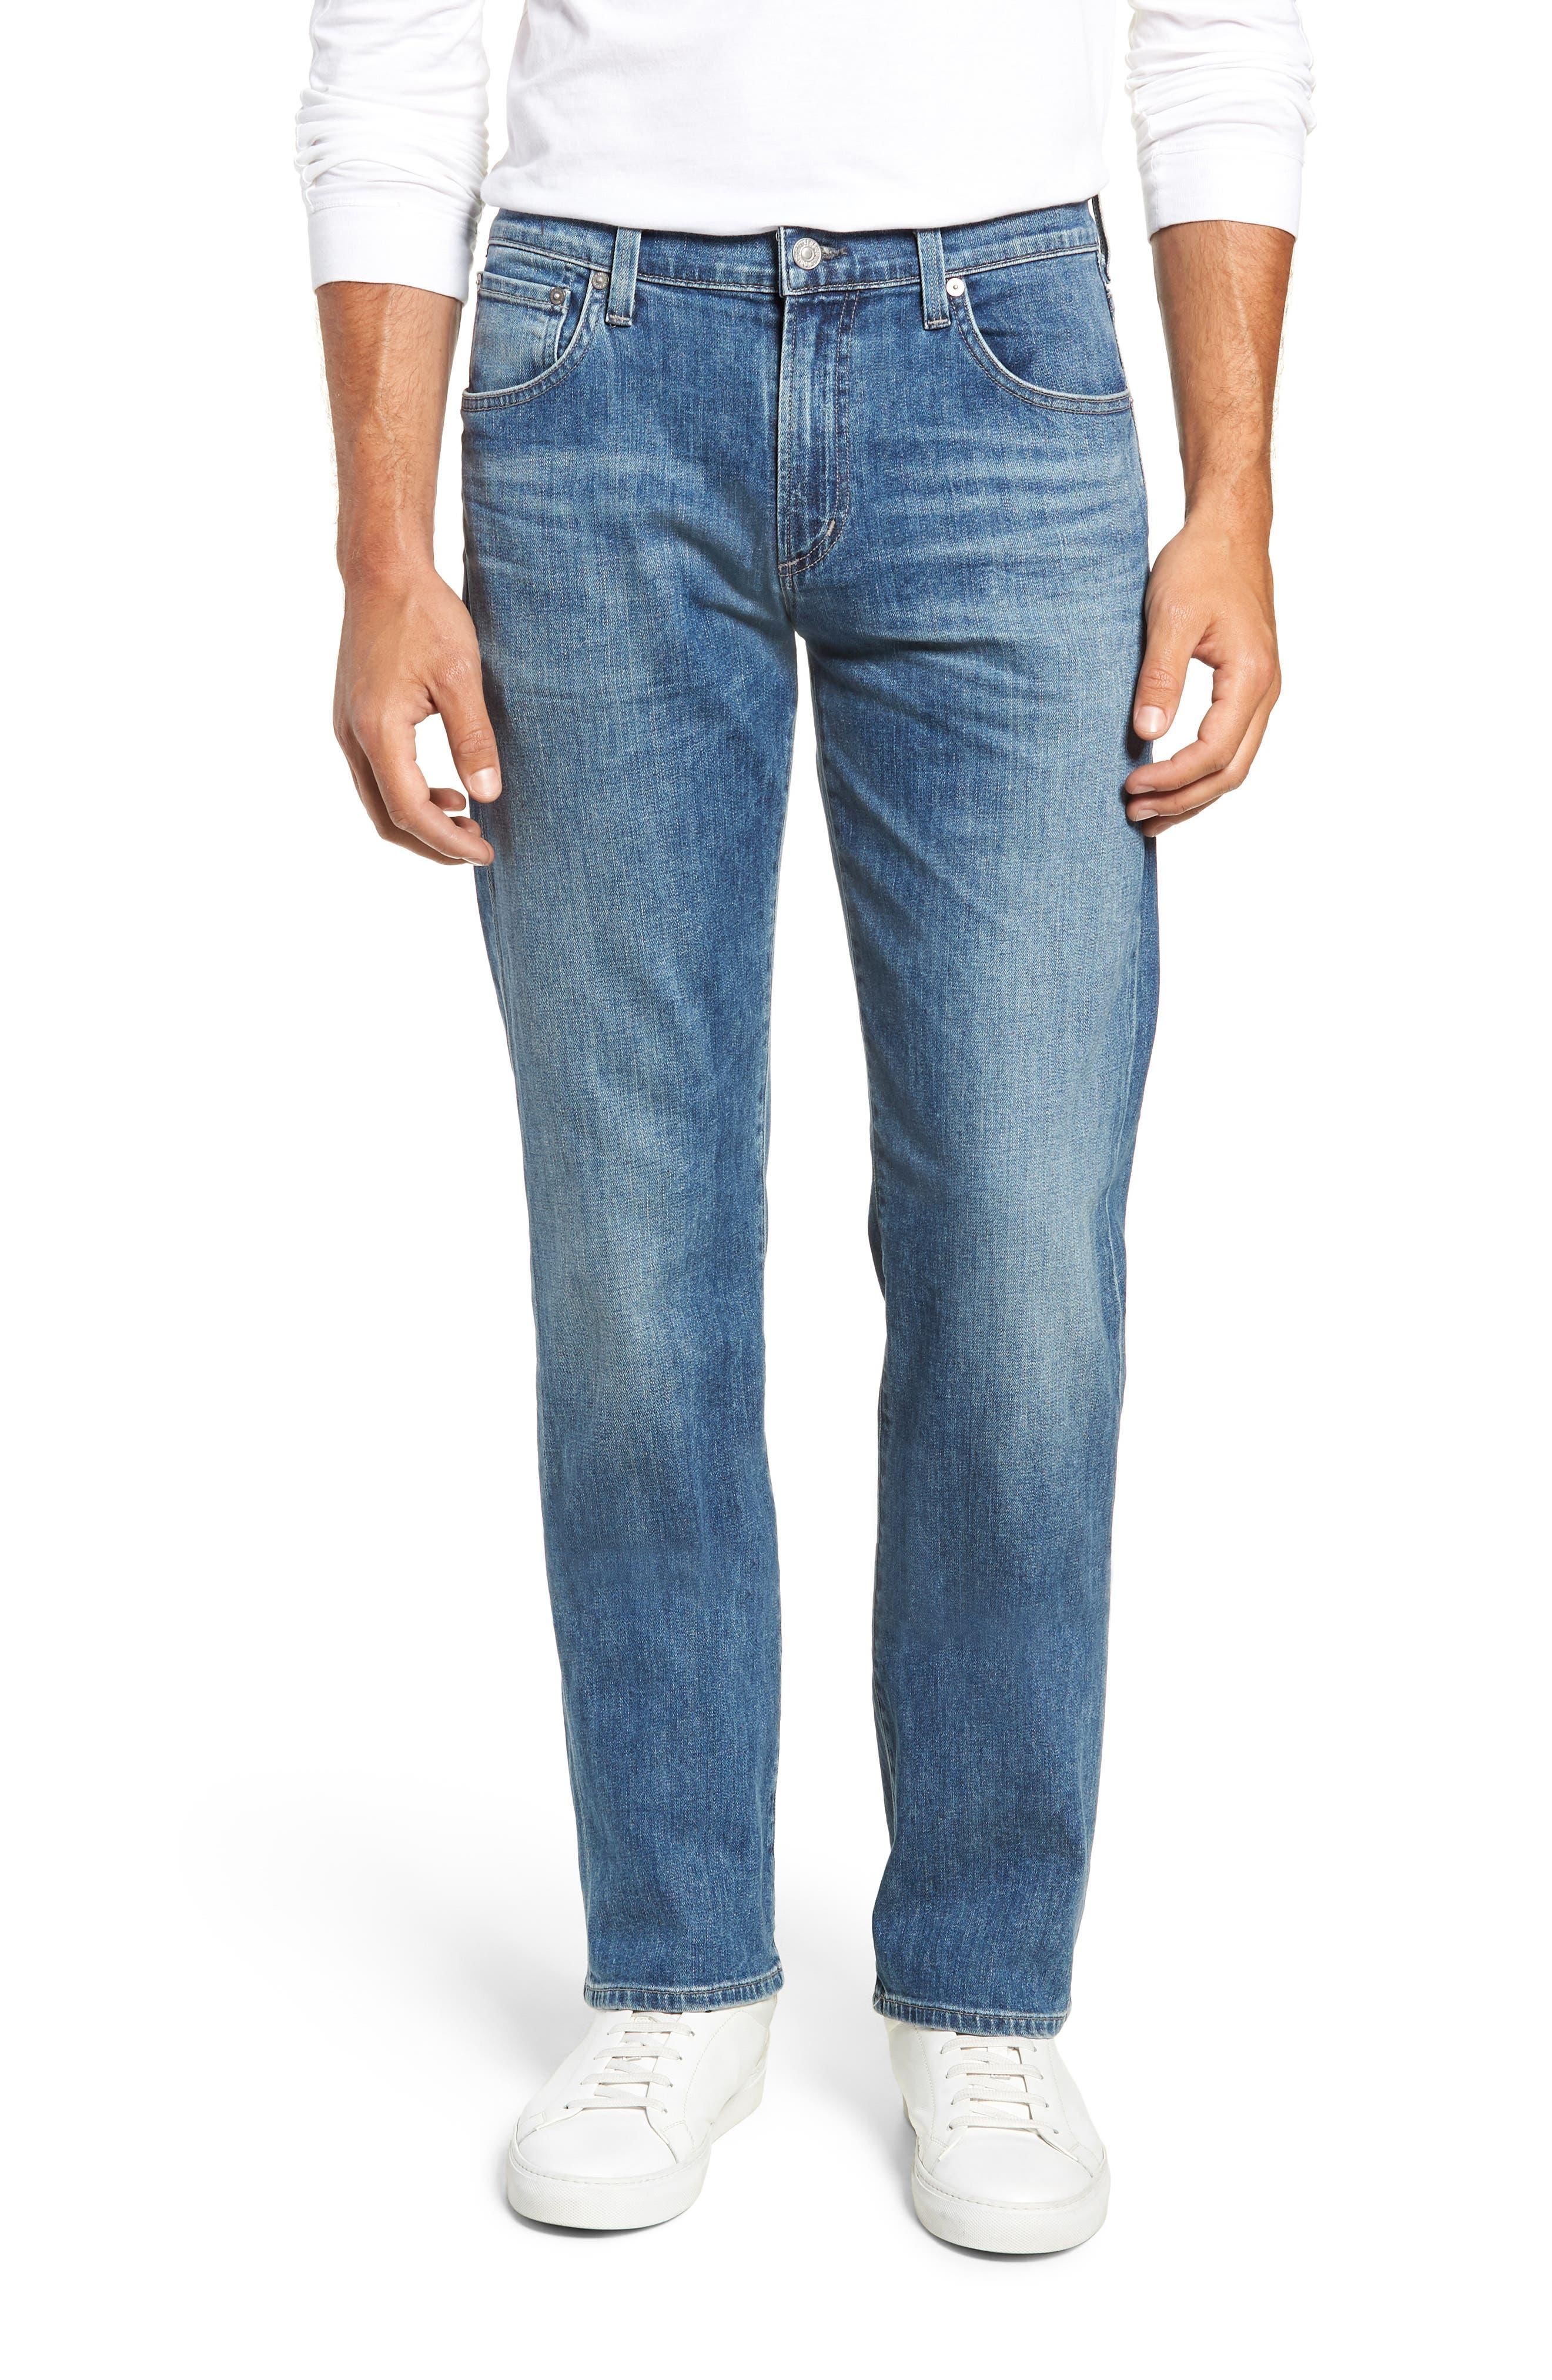 Sid Straight Leg Jeans,                             Main thumbnail 1, color,                             YUKON